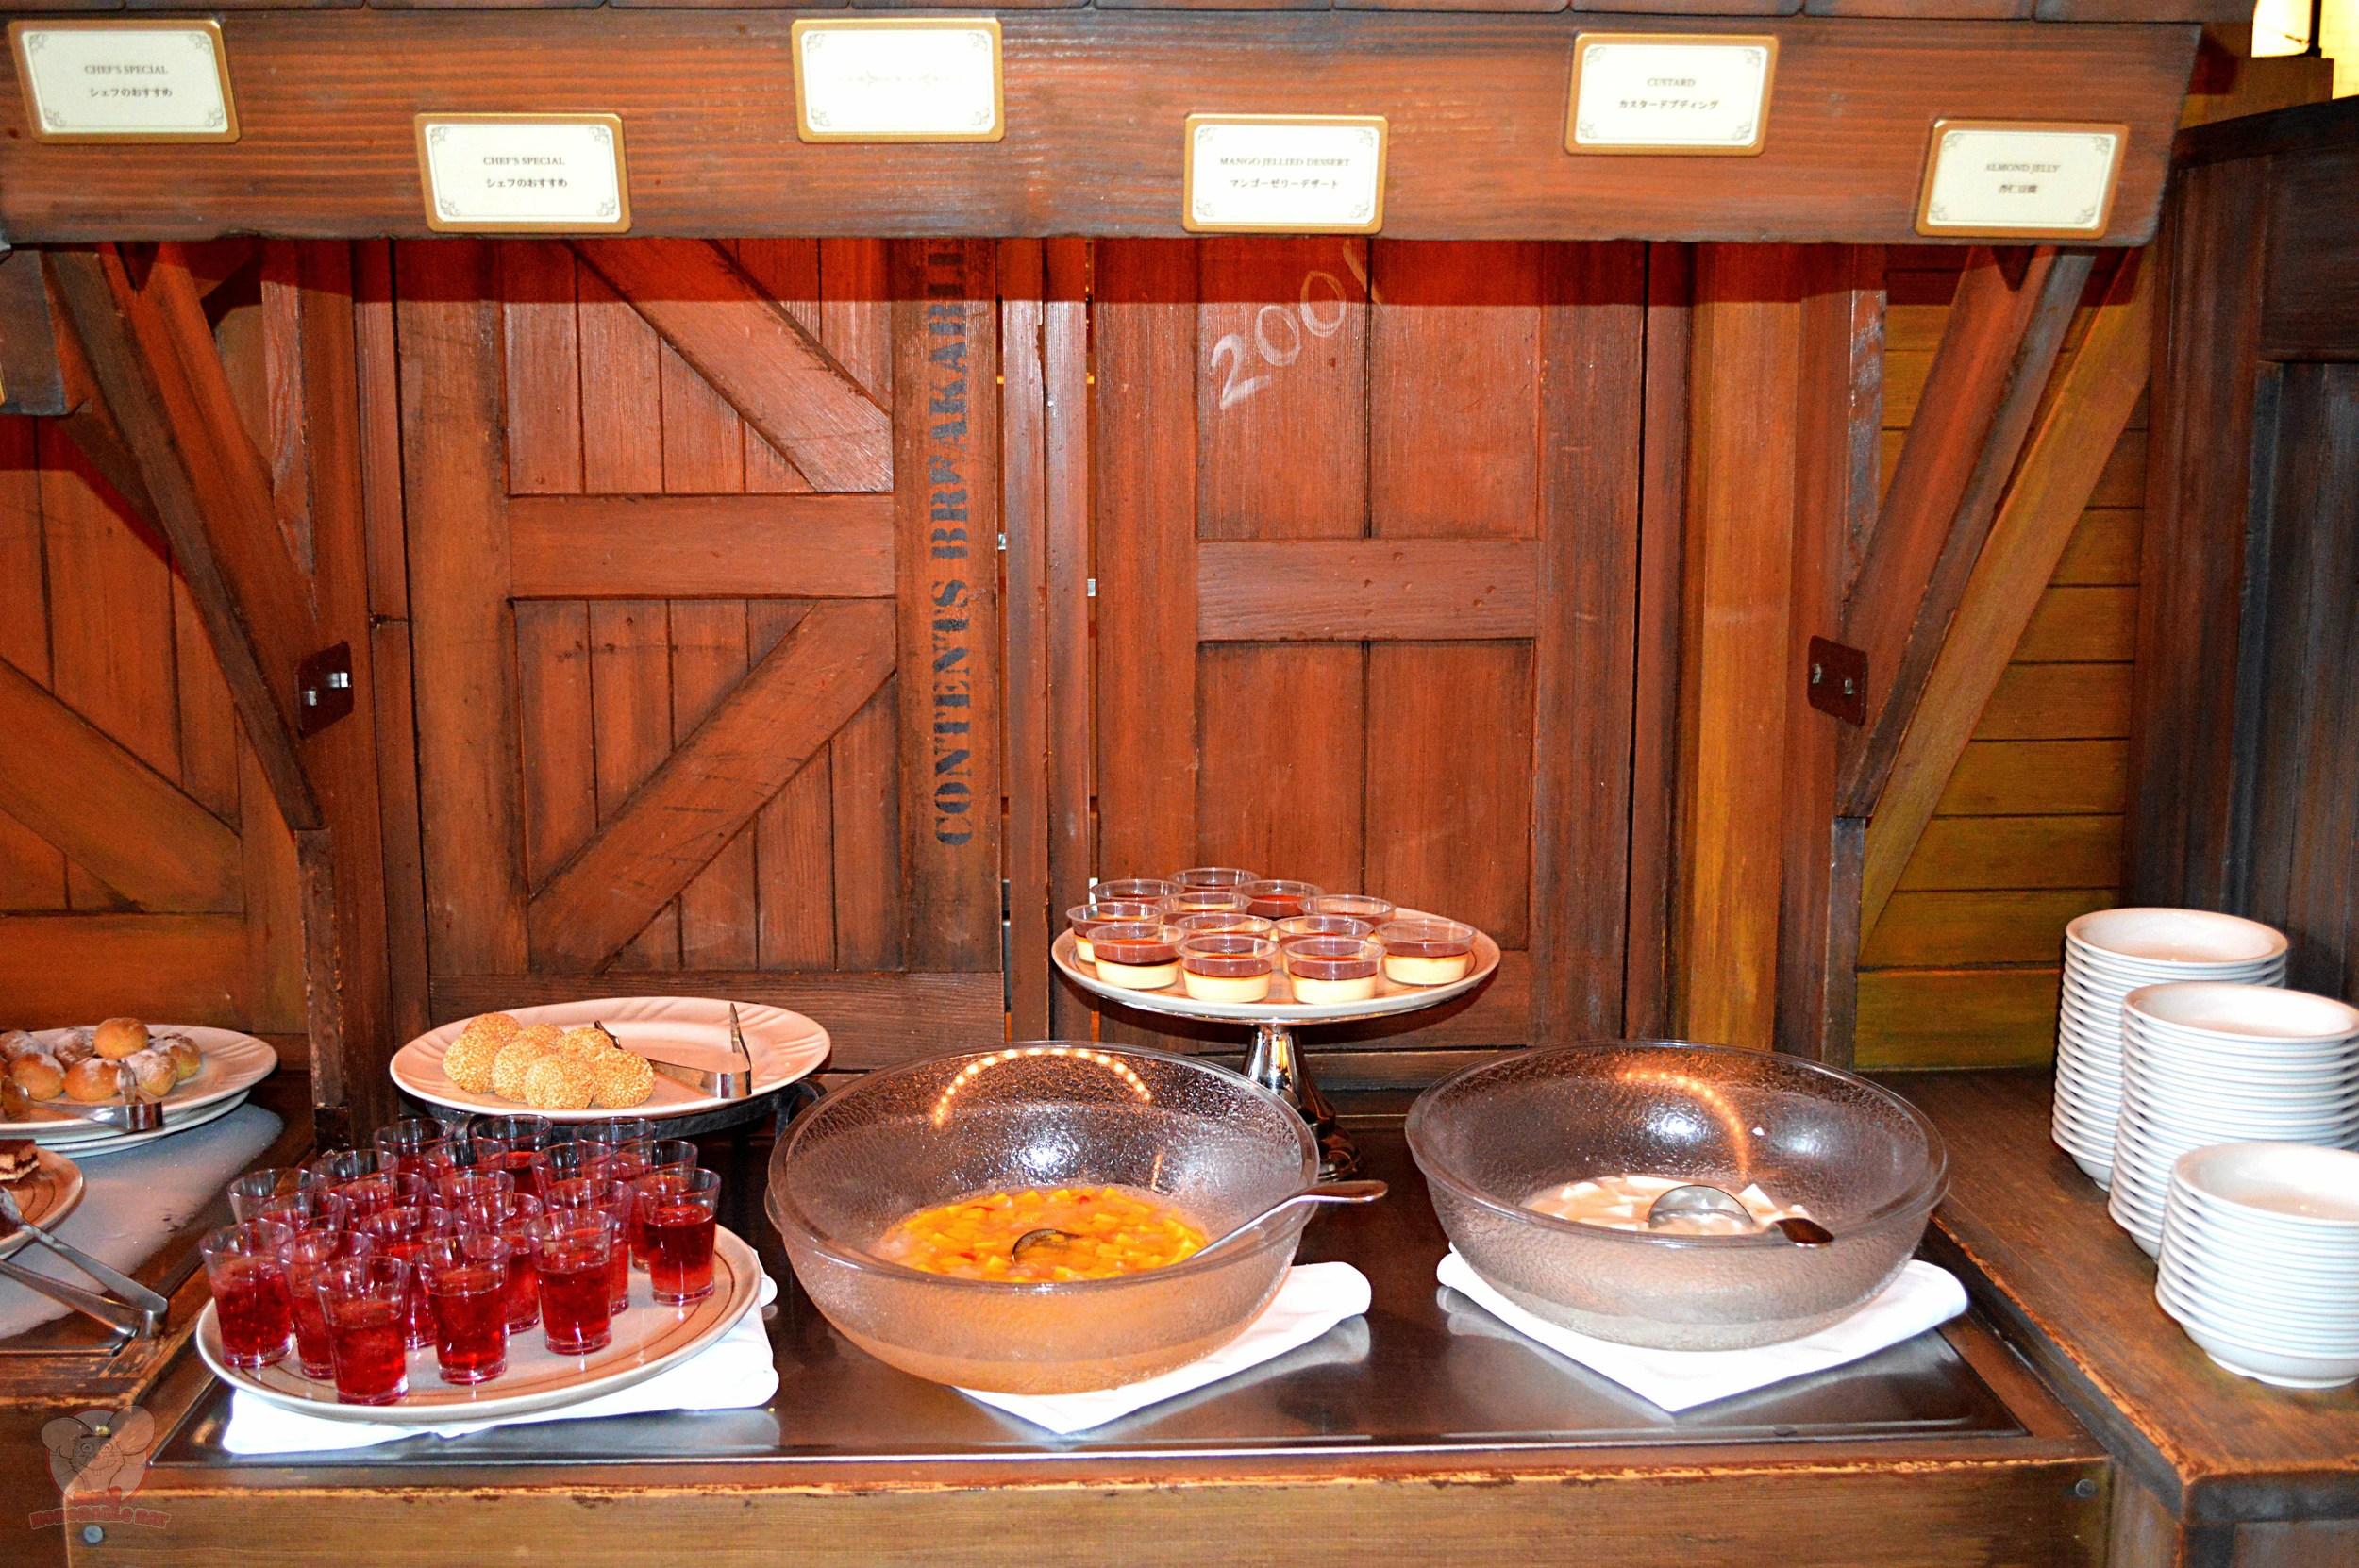 Dockside Desserts selection (A)